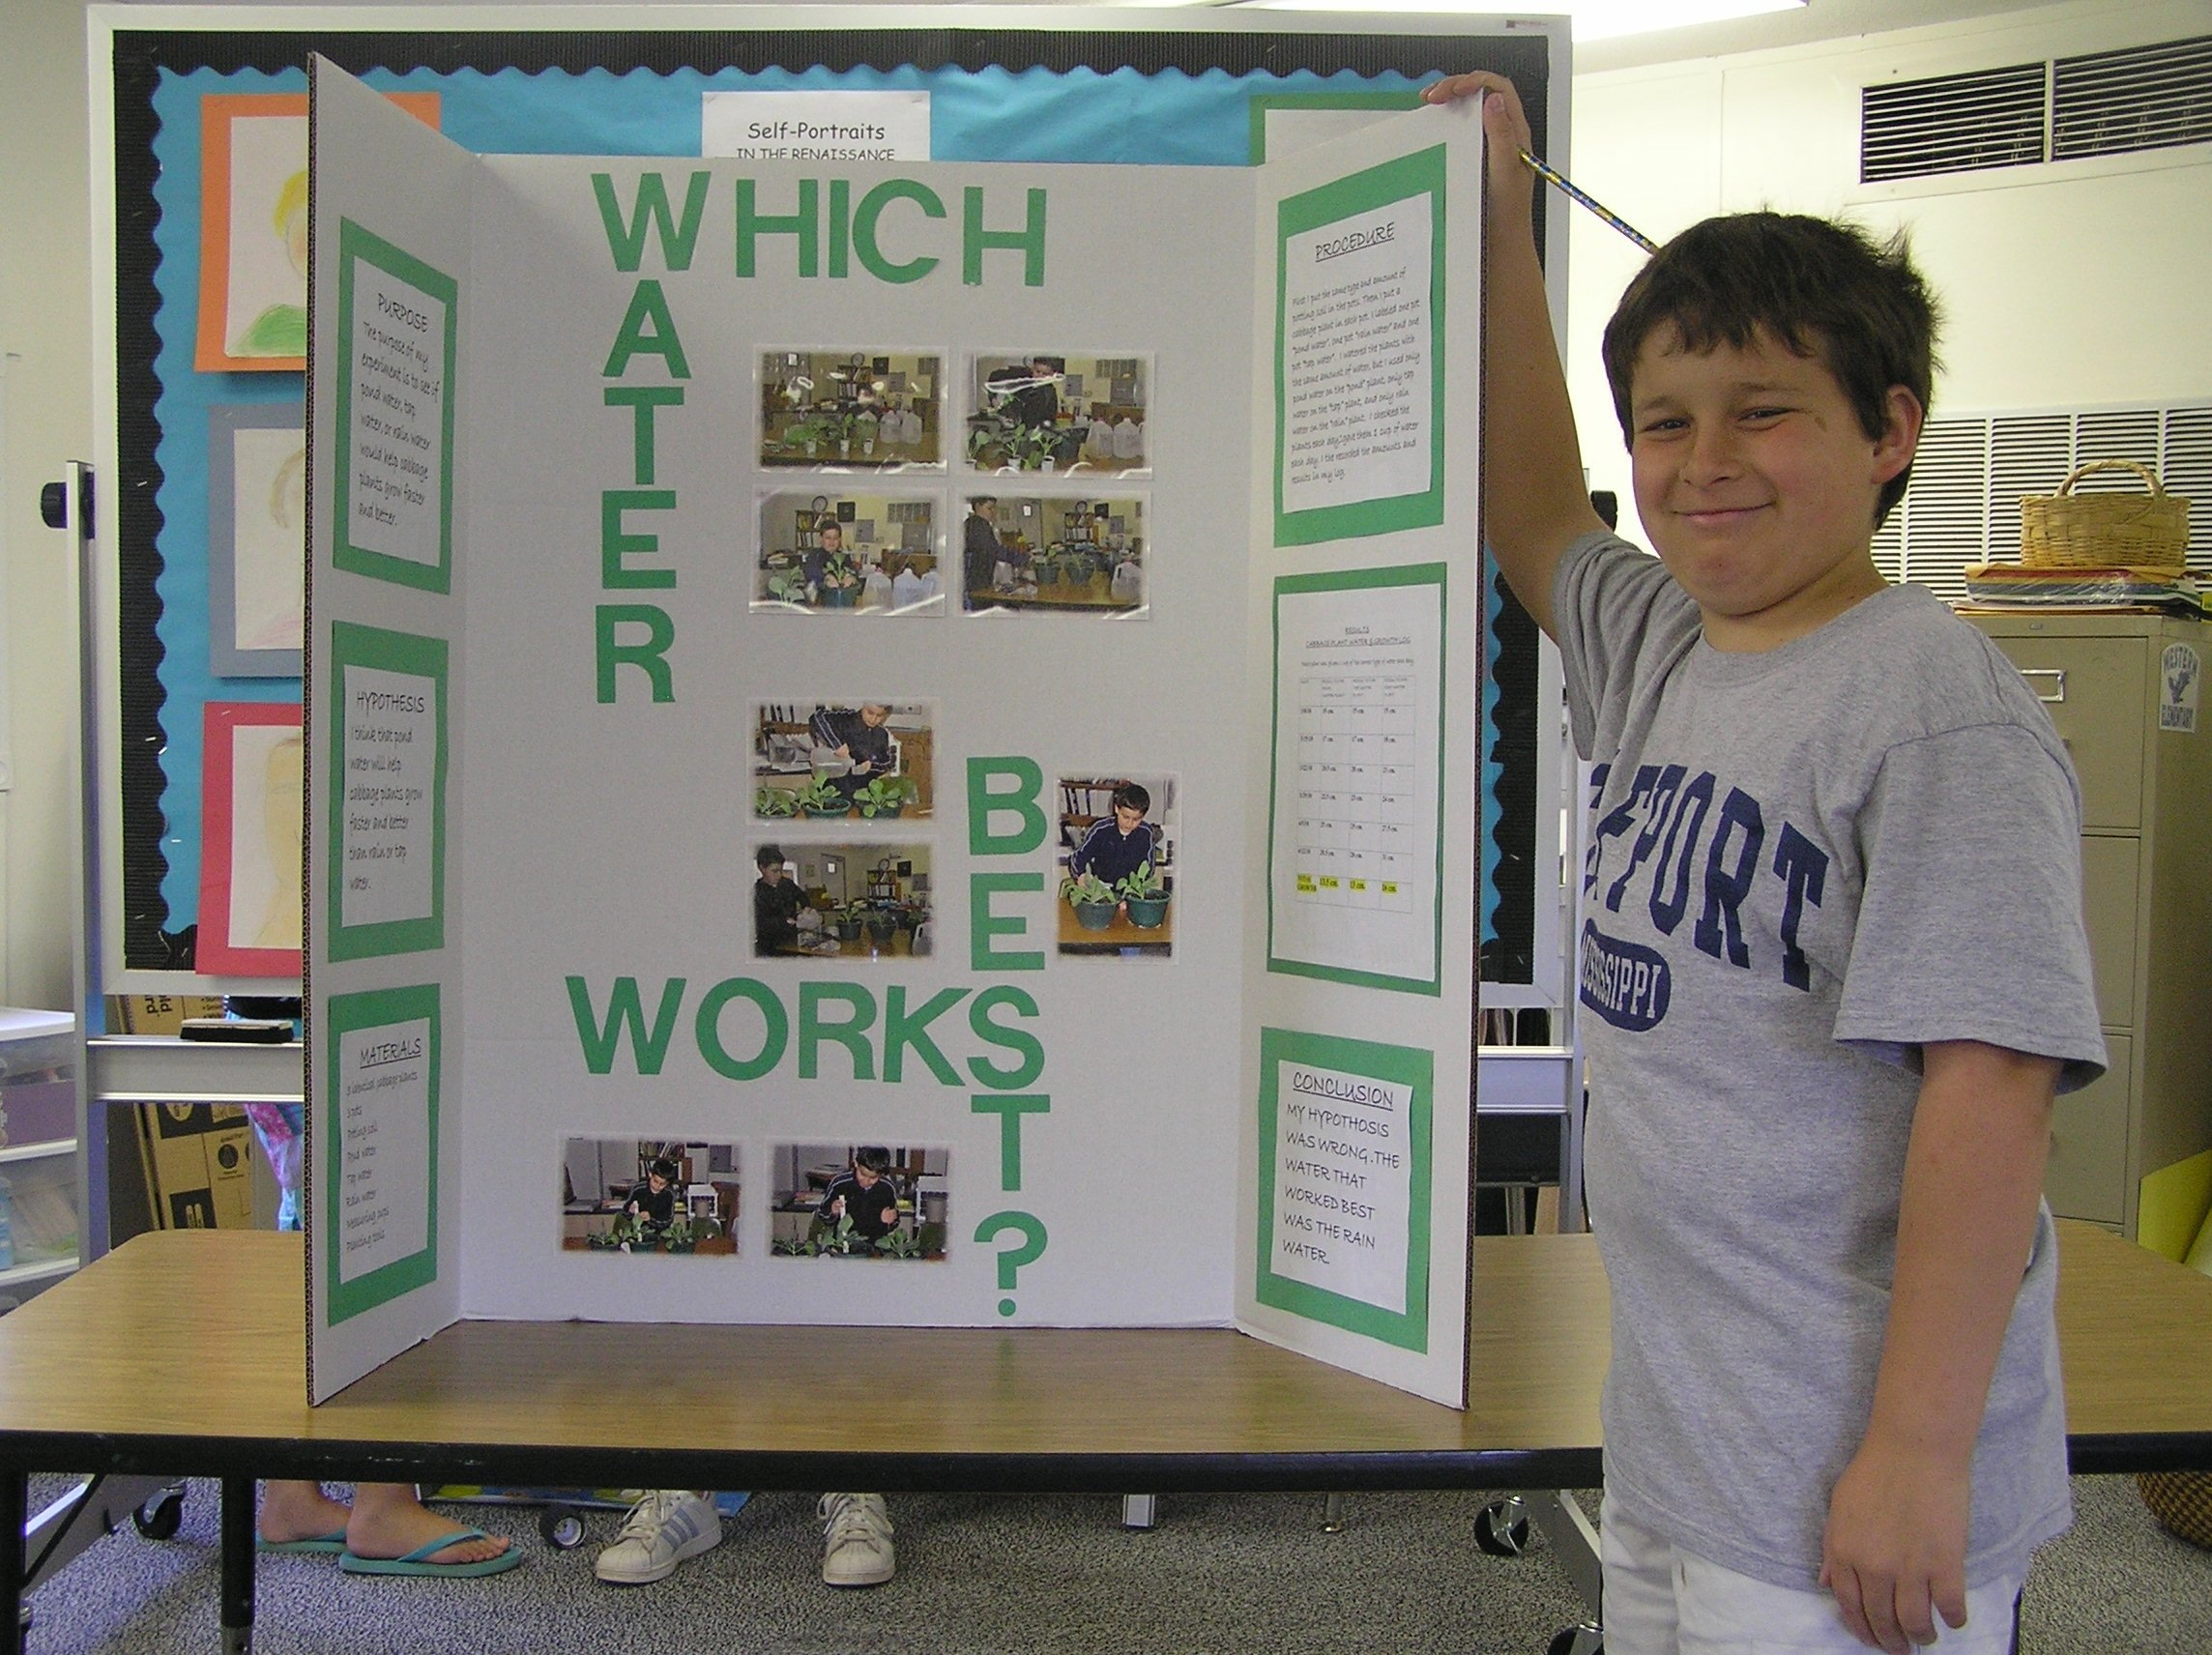 10 Stunning Science Fair Ideas For 4Th Grade 2010 regional science fair winne ideas collection 4th grade science 1 2021